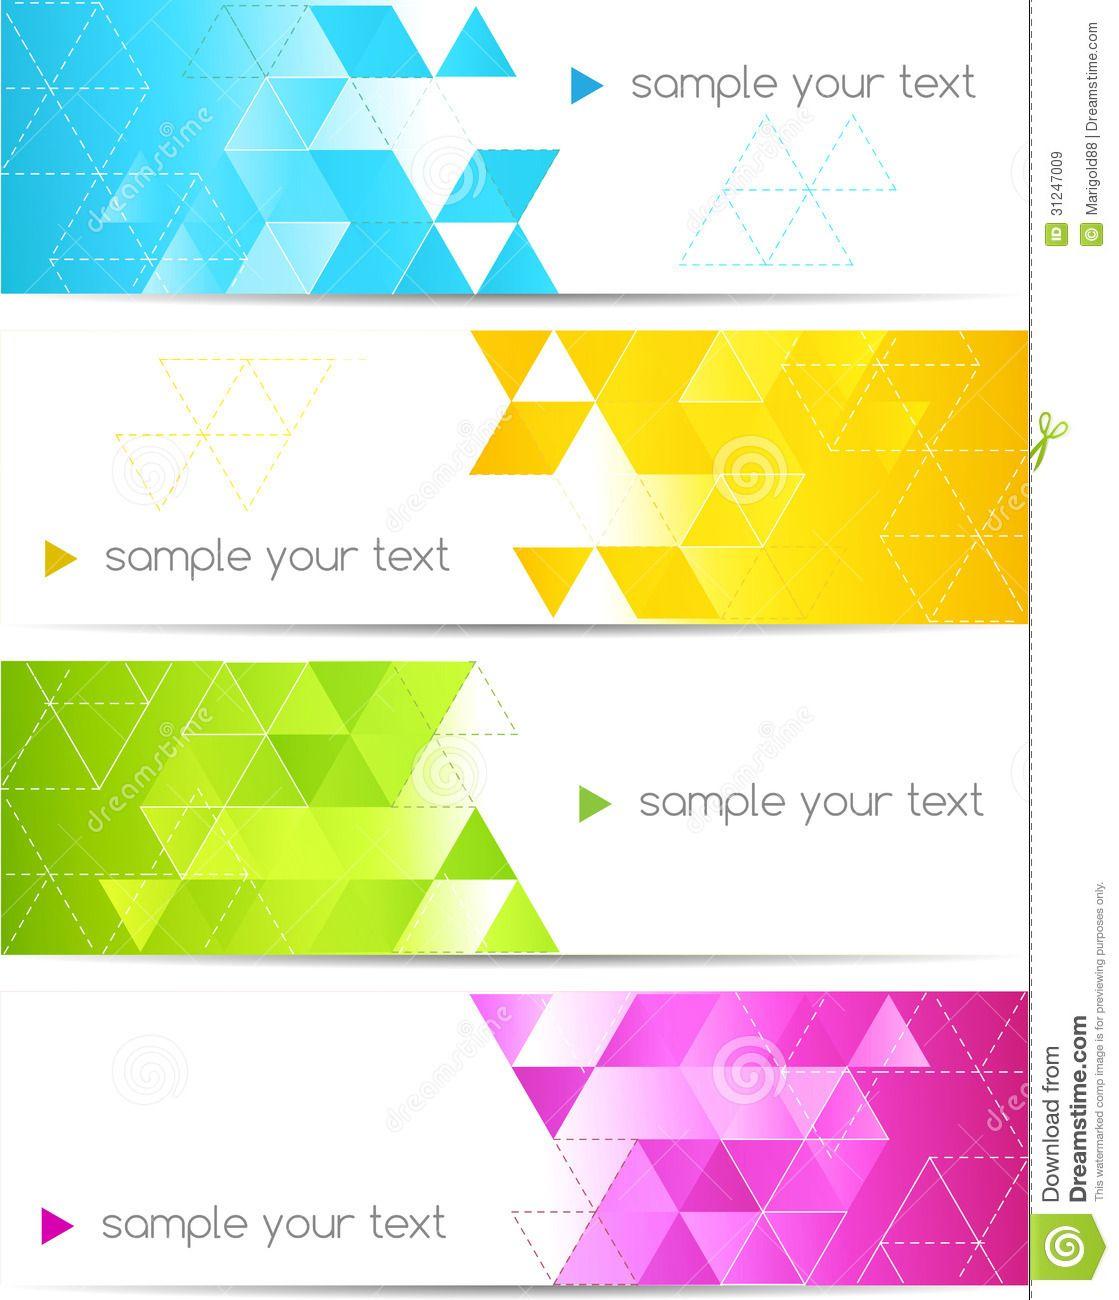 banner design pattern trend 2015 - Google 검색 | 건설기술처 ...